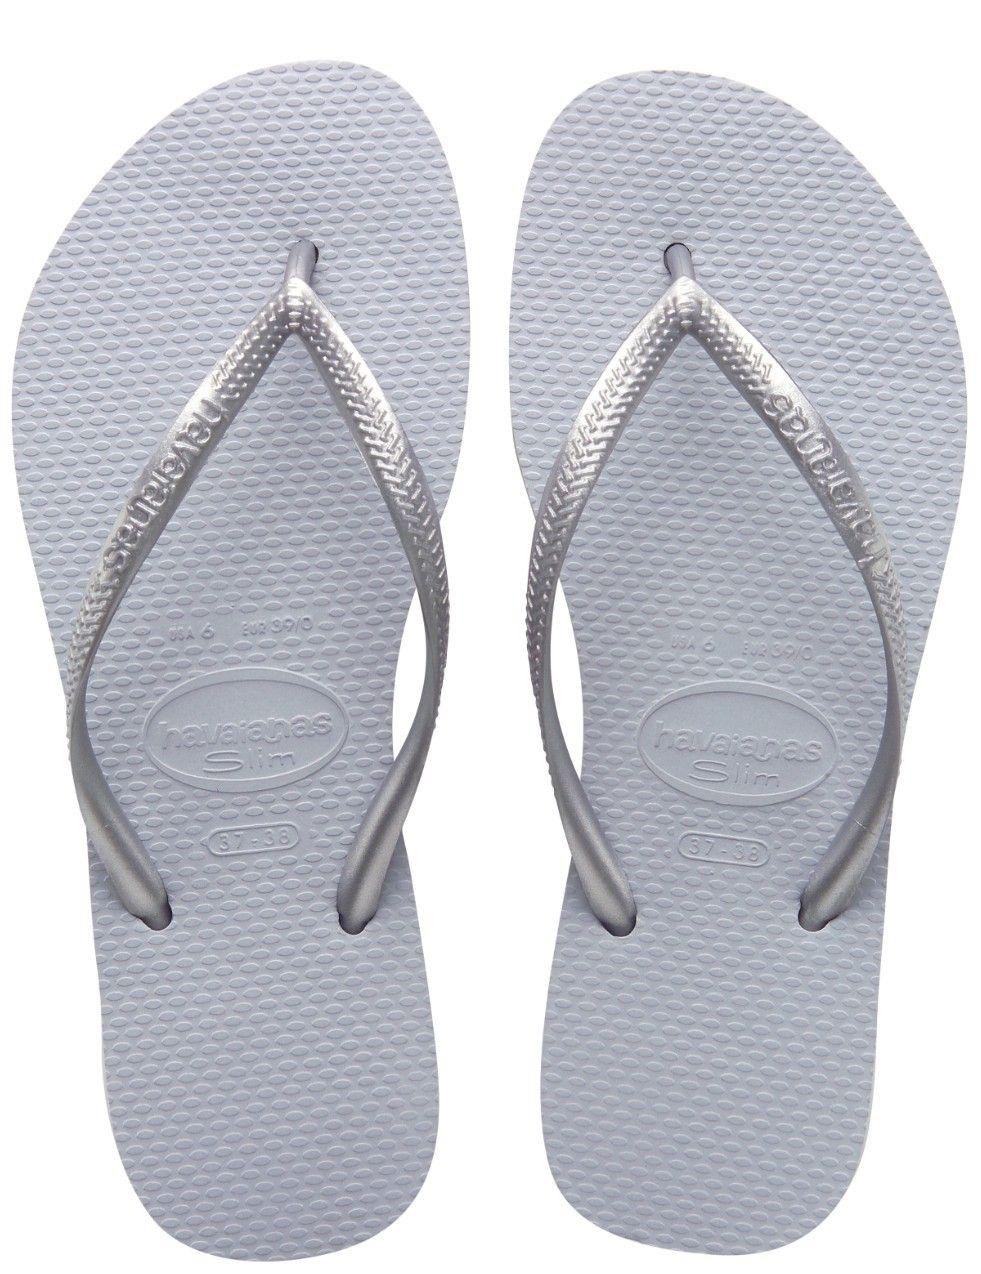 3/5] Grey Havaiana Slim Sandals